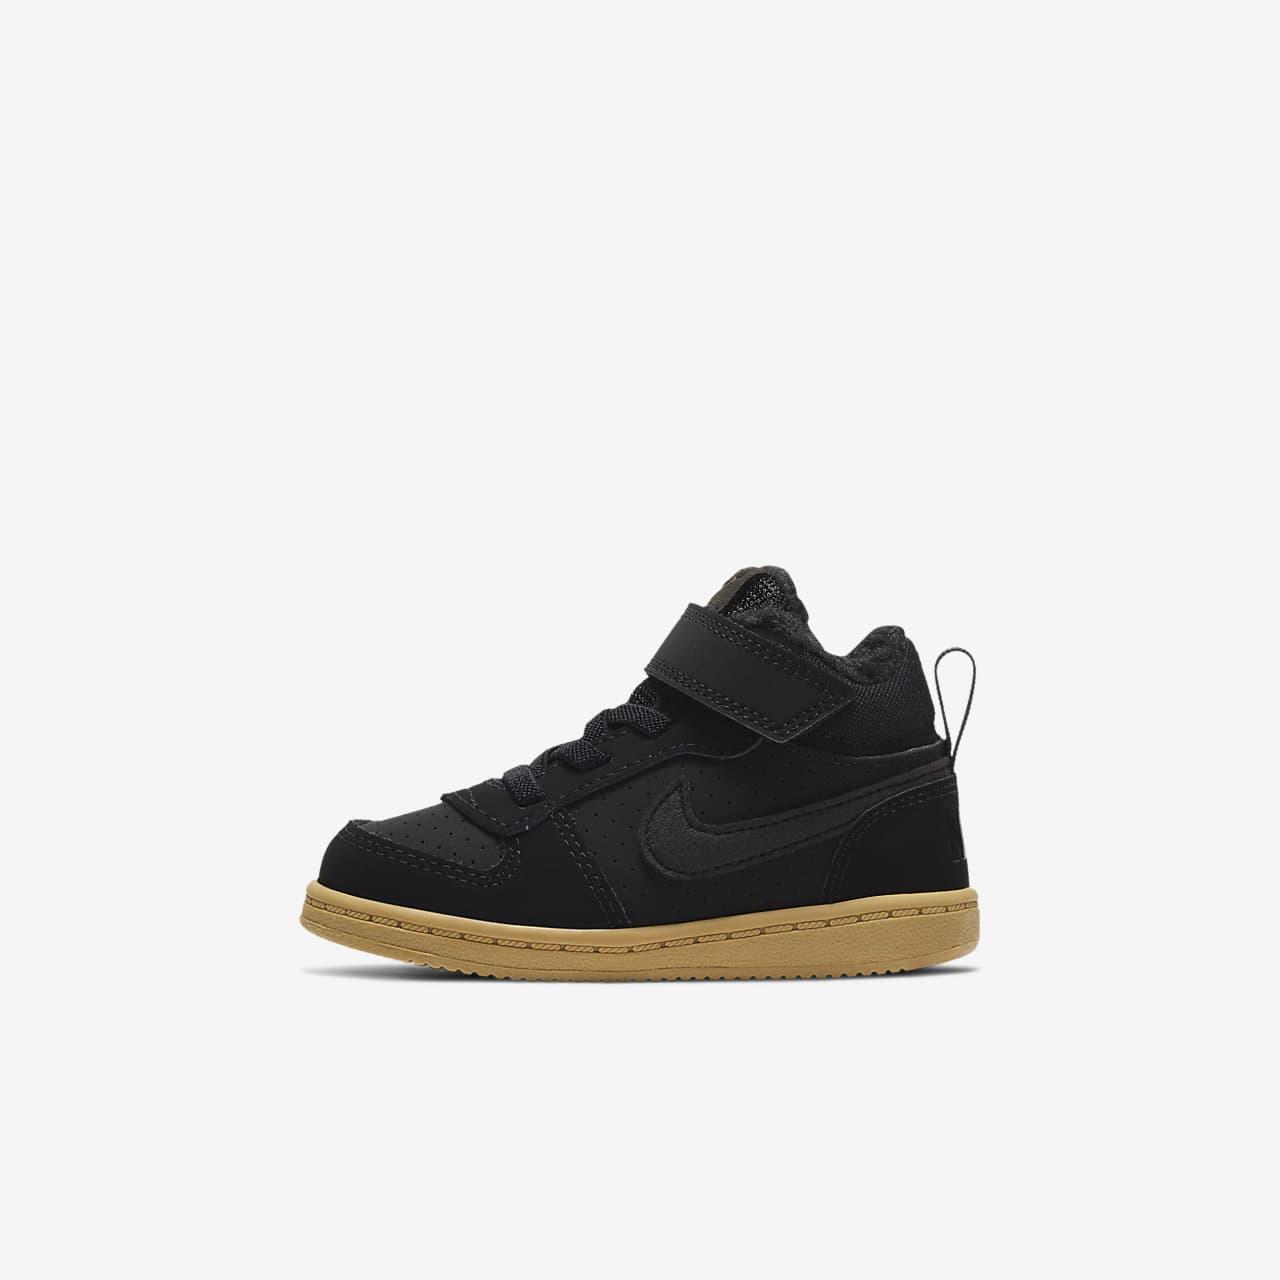 big sale 3a5ac 22164 Nike Court Borough Mid Winter-sko til babyer/småbørn. Nike.com DK